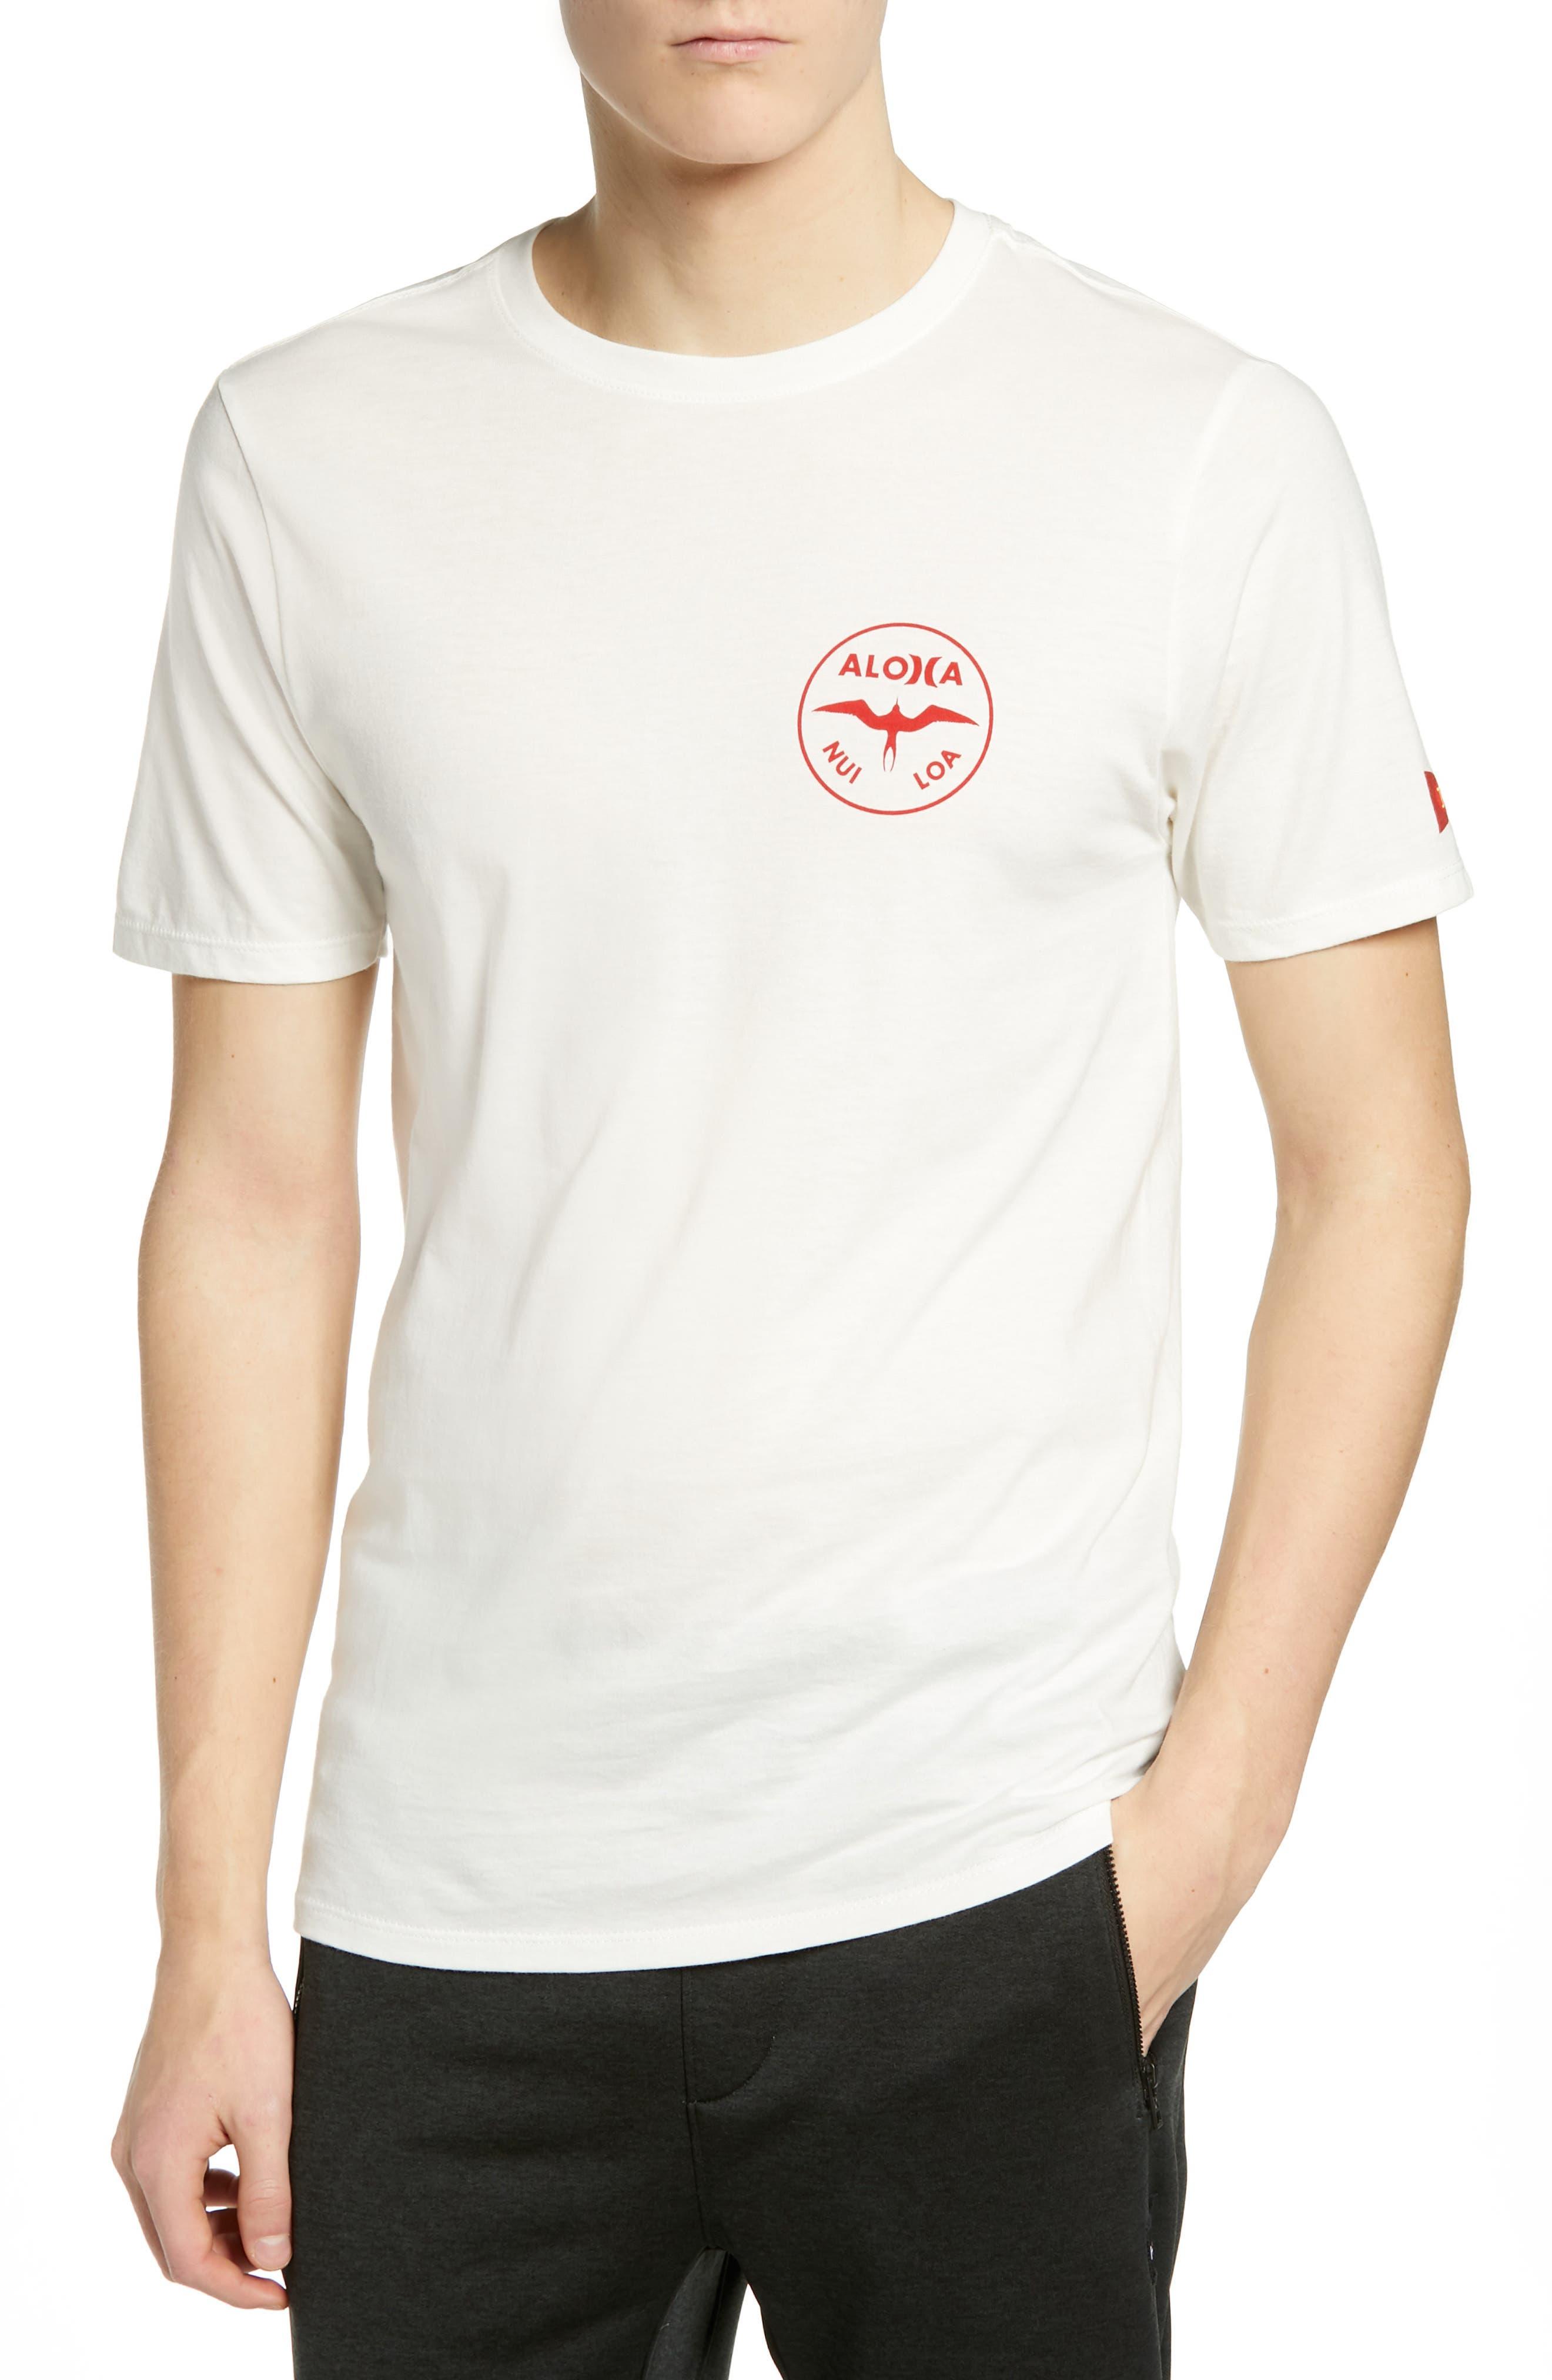 HURLEY Premium Jjf Aloha T-Shirt in Sail